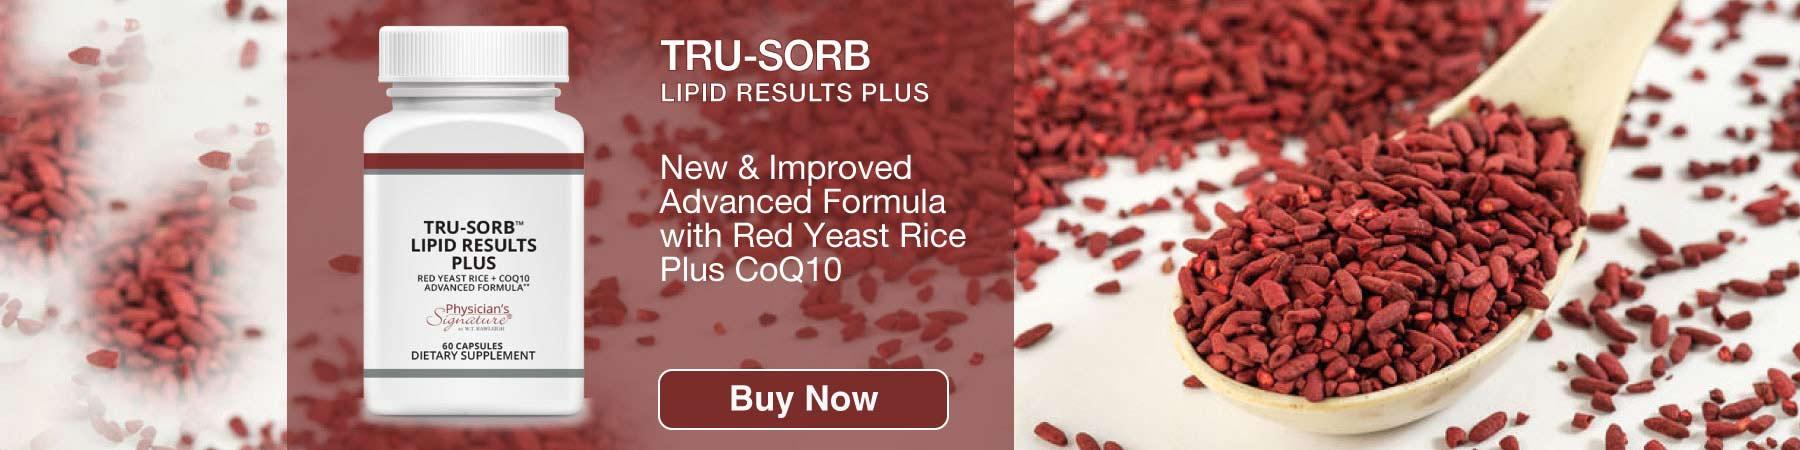 Lipid Results Plus